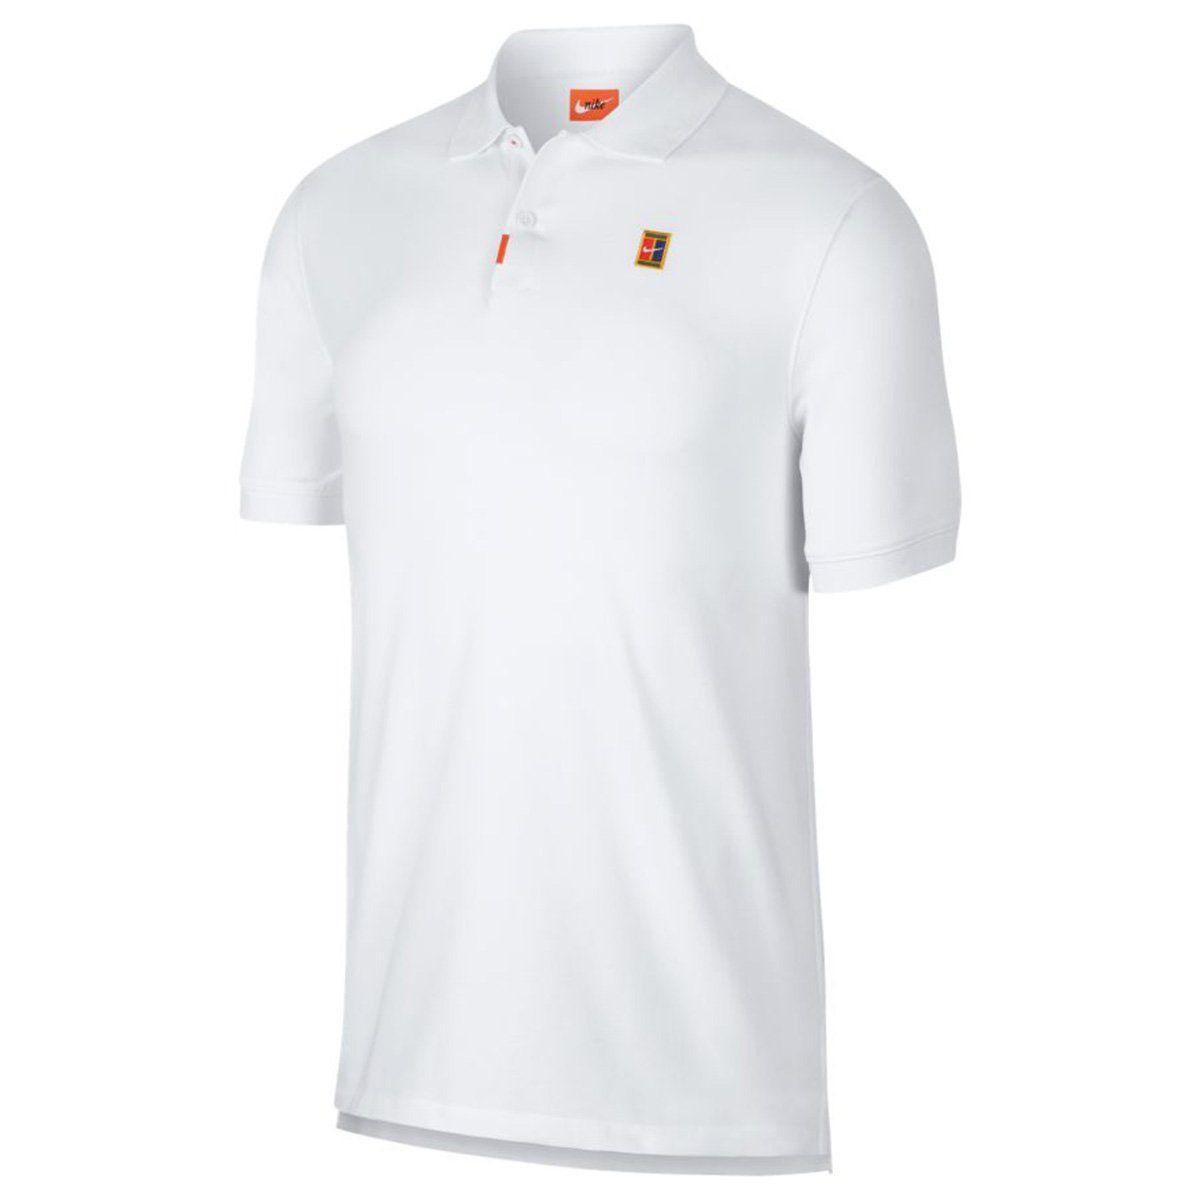 Camisa Polo Nike Natural Performance - Branco